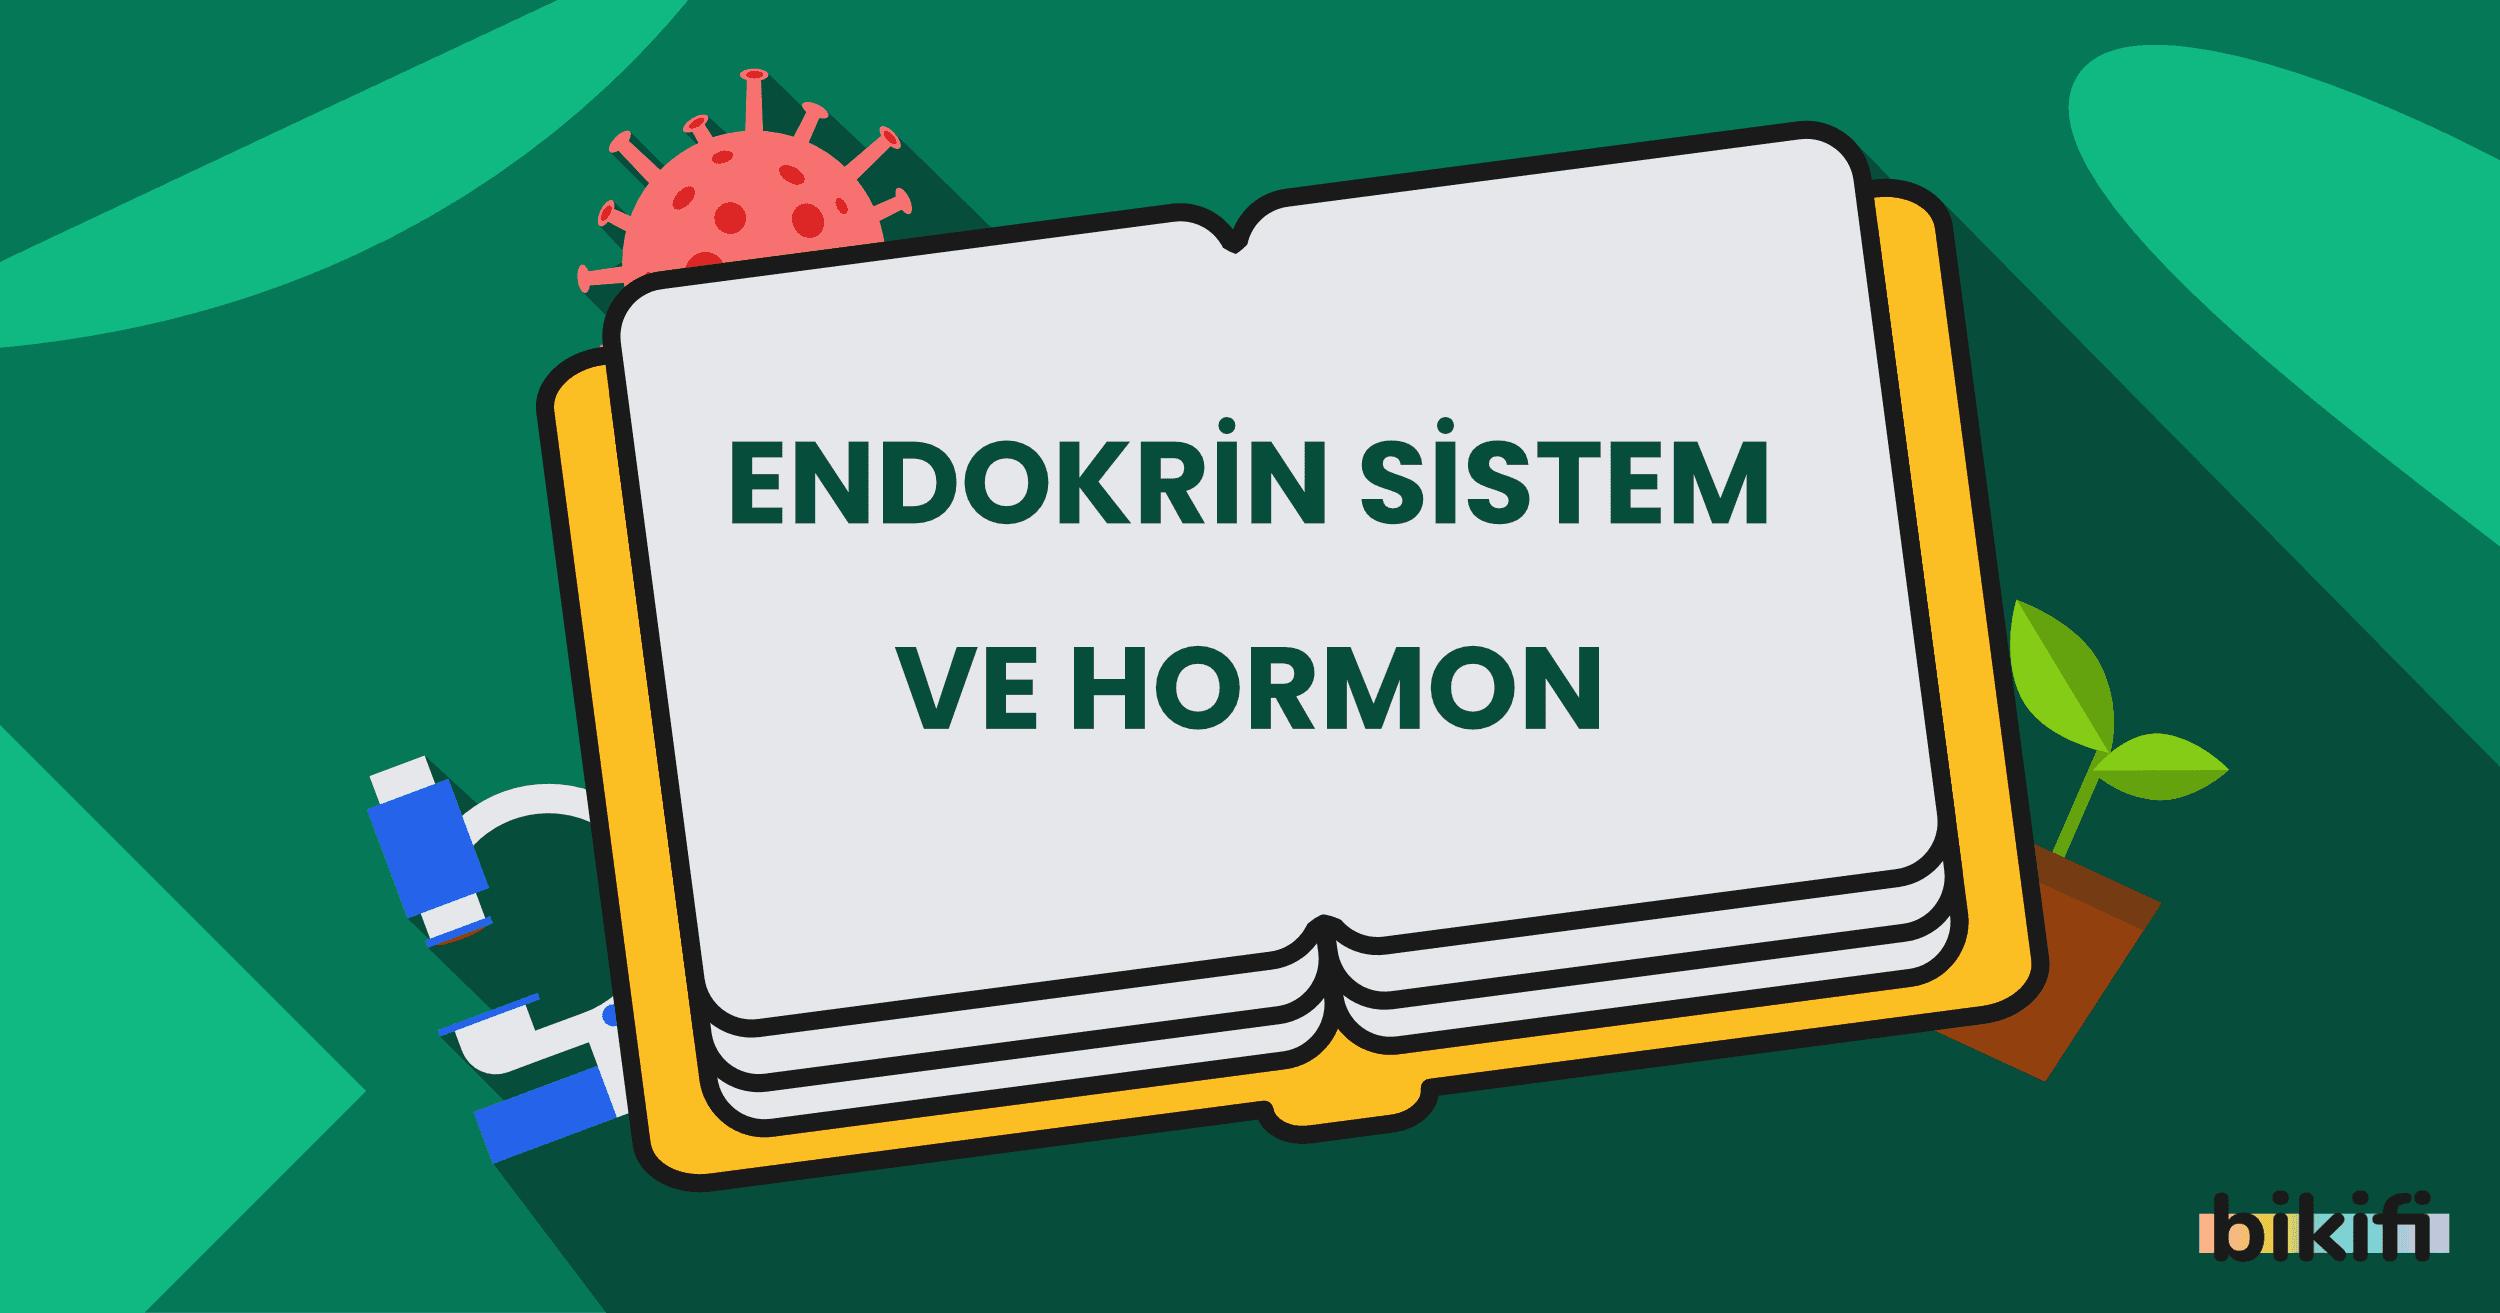 Endokrin Sistemi ve Hormon